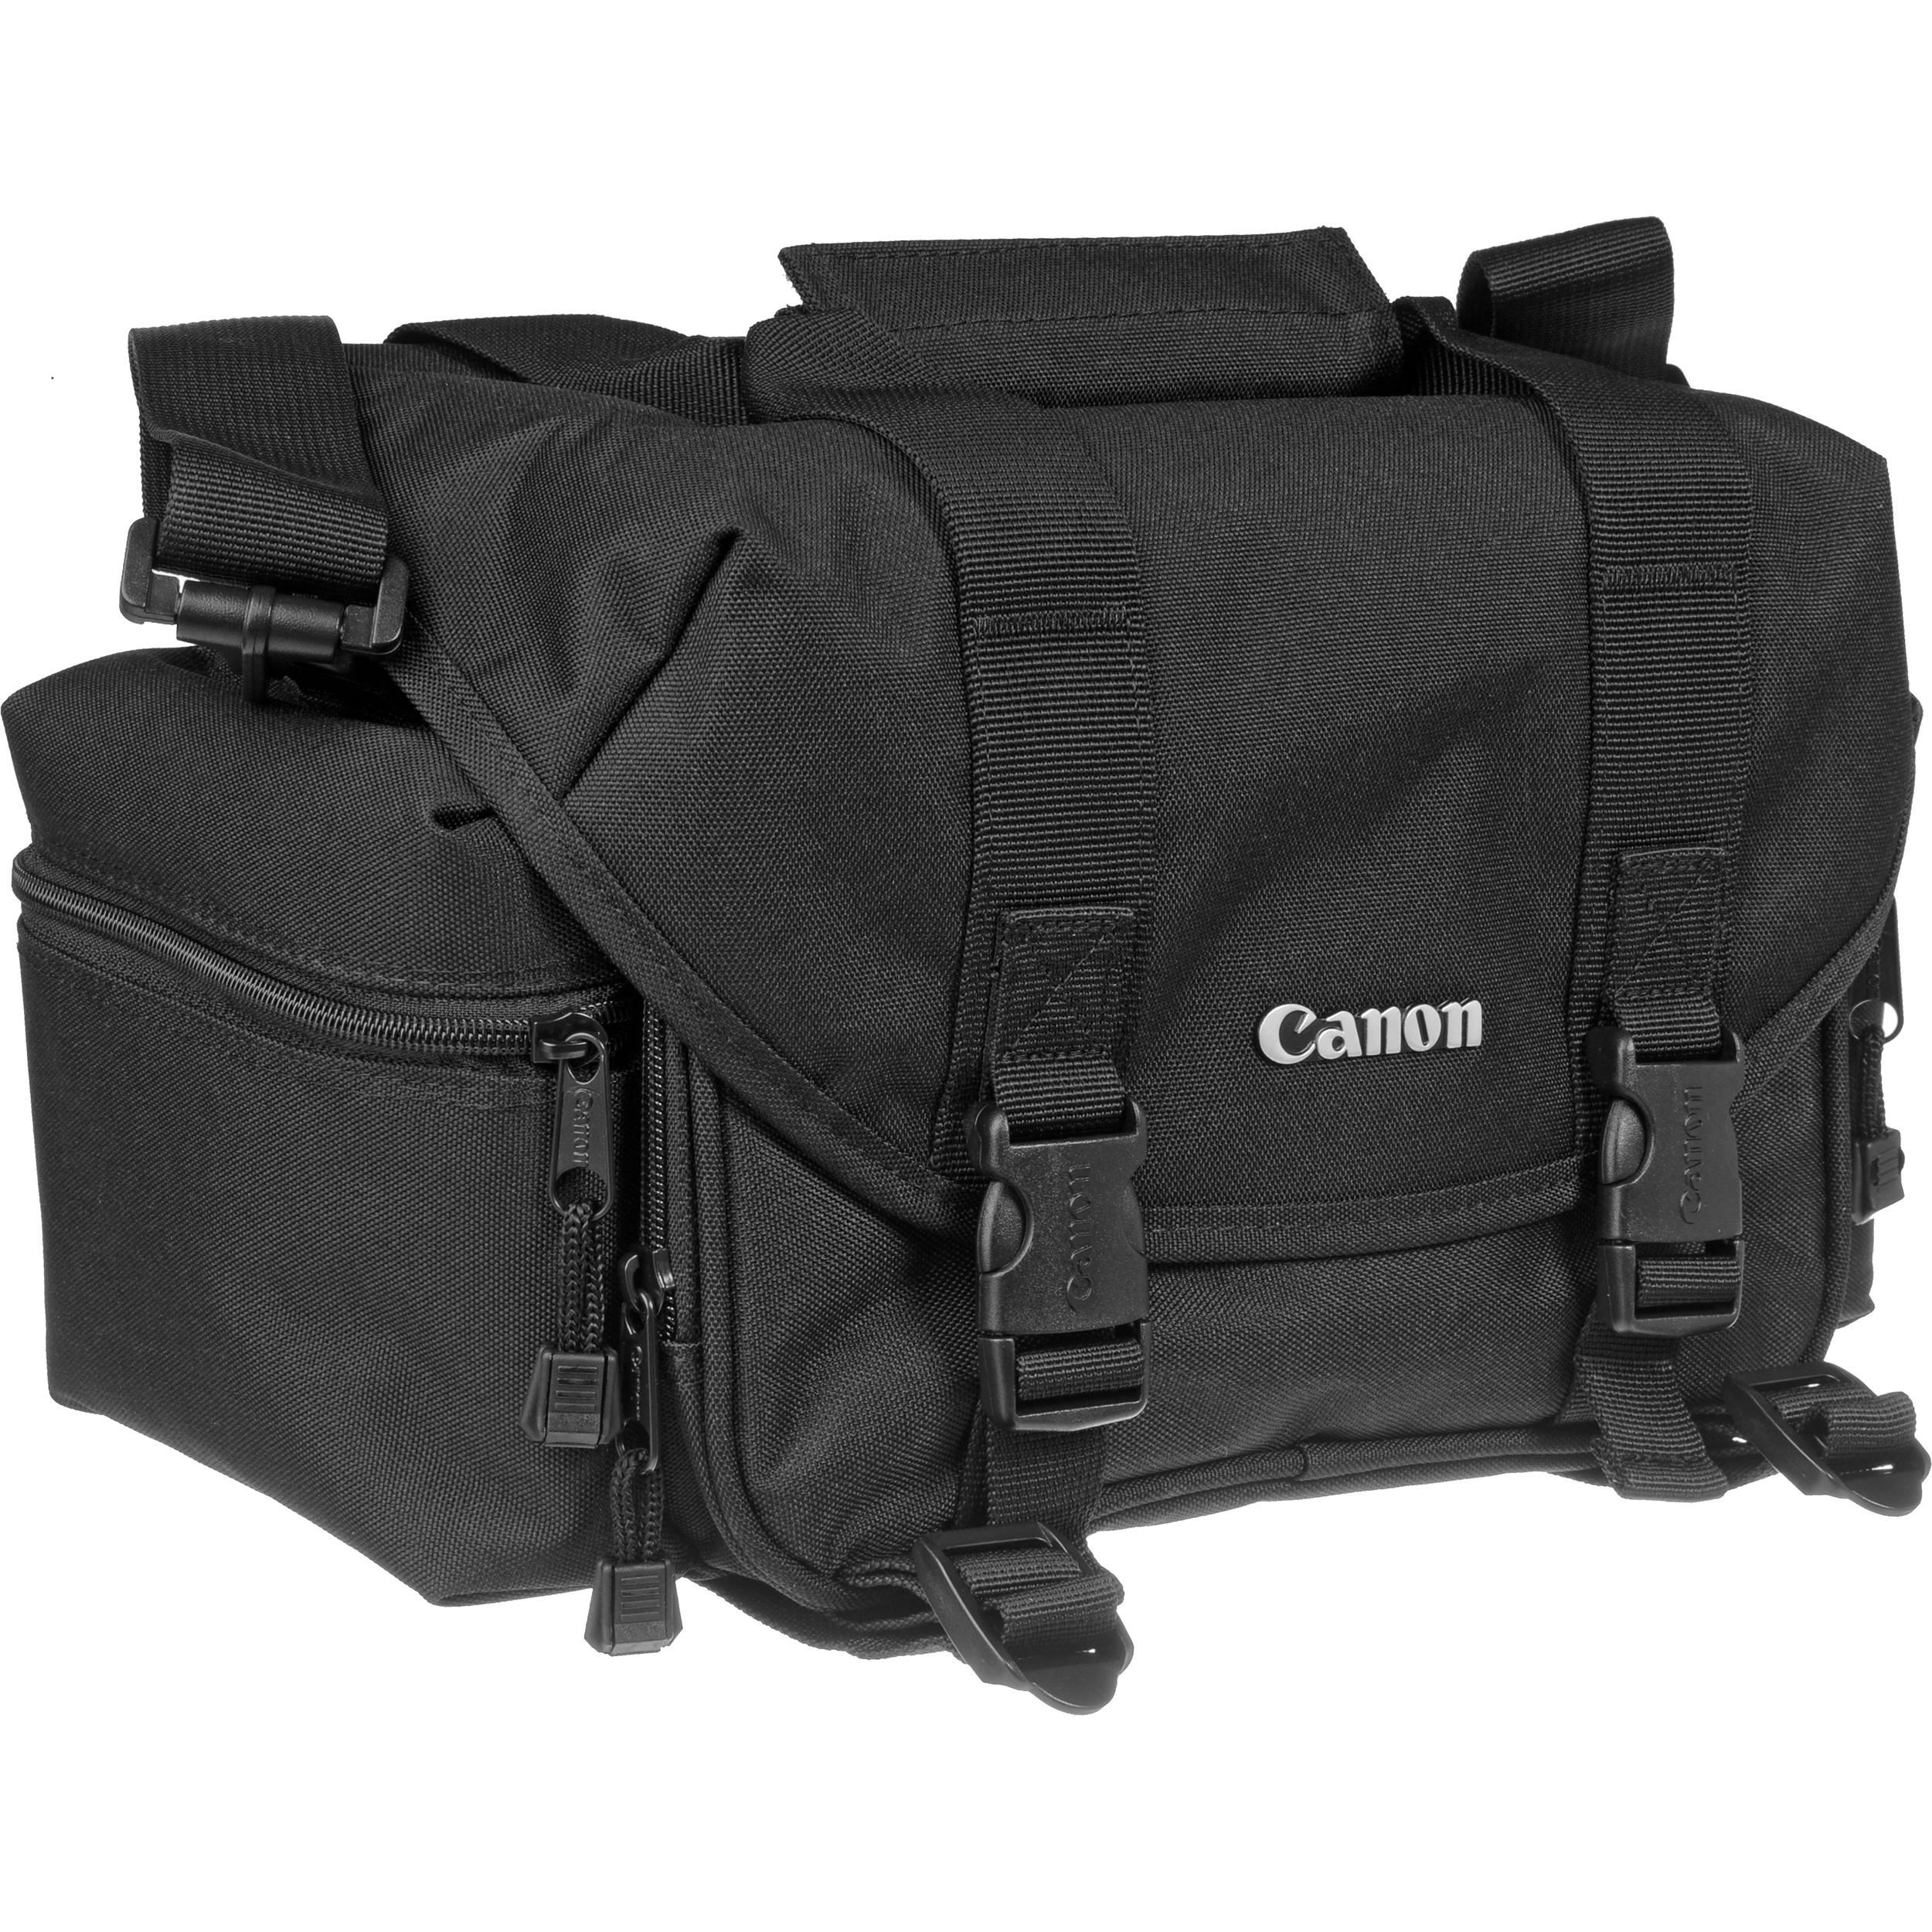 Camera Canon 20da Dslr Camera canon eos 20da dslr images guru a gadget bag